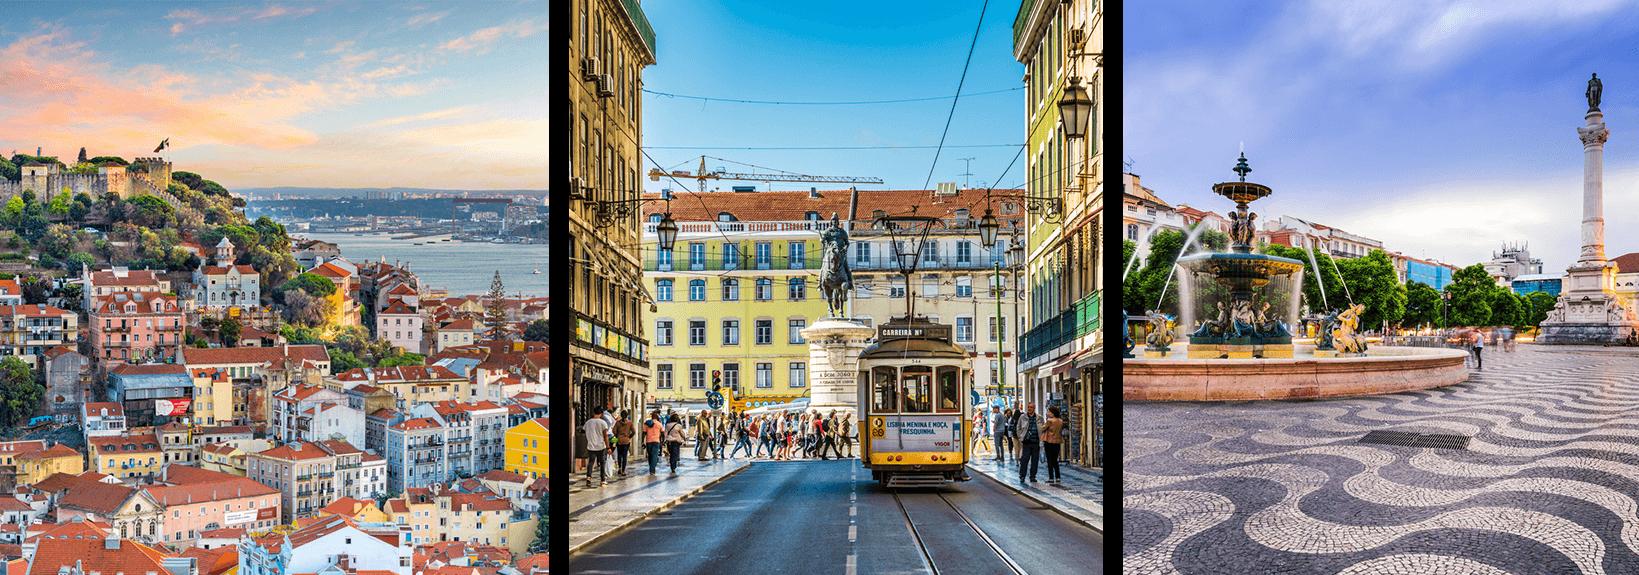 Lisbon sightseeing locations